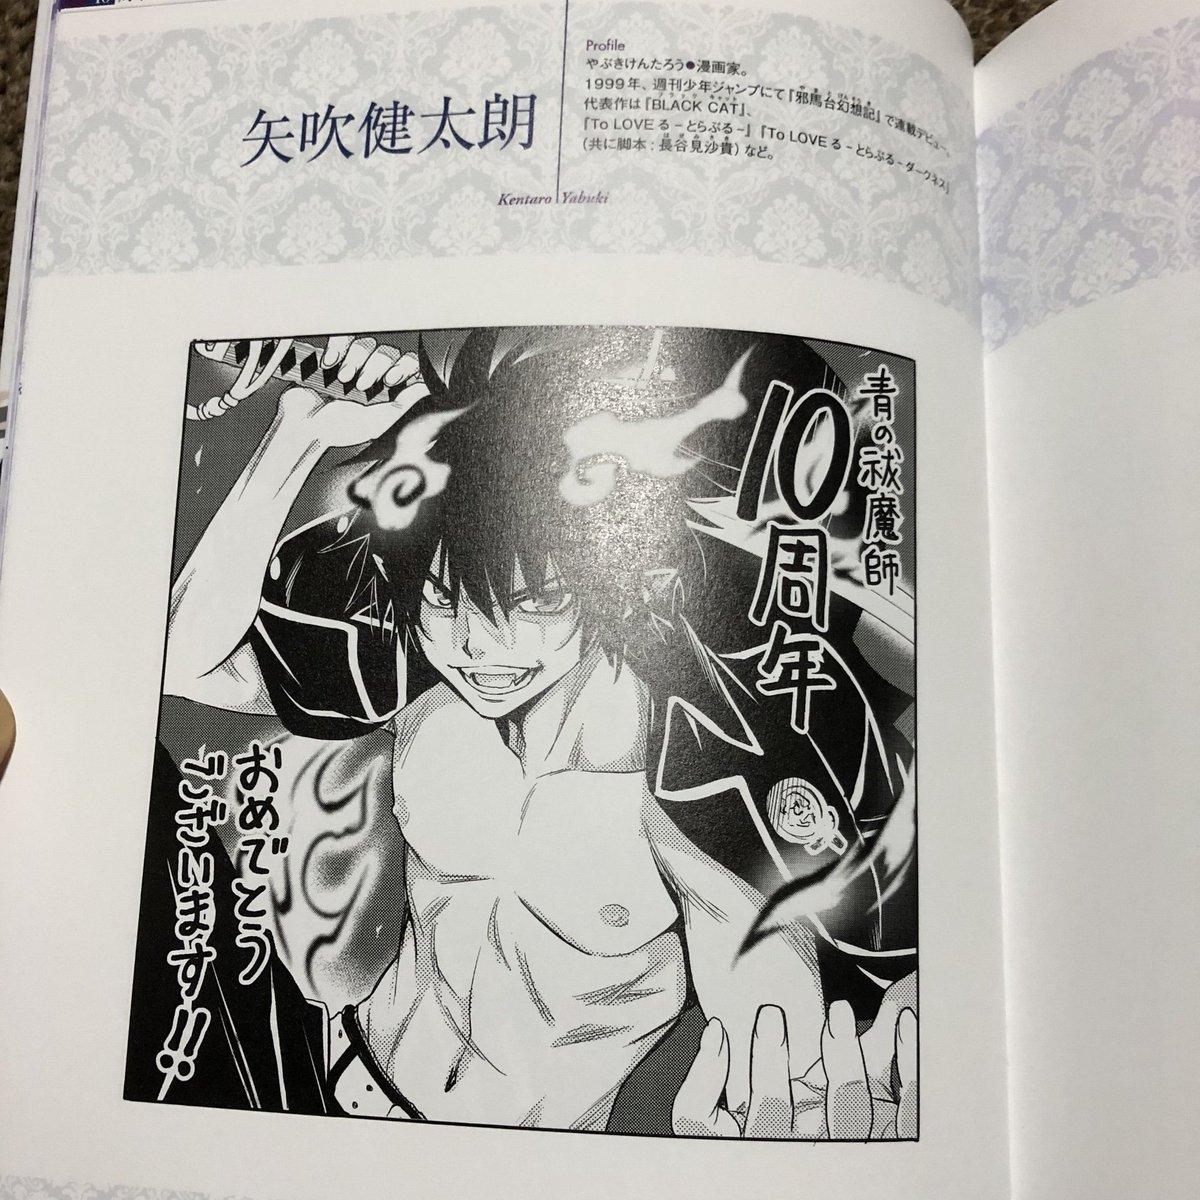 "Ilustración de Kentaro Yabuki para el Artbook del 10° Aniversario del Manga ""Ao No Exorcist"" (Blue Exorcist) de Kazue Kato. Serializado en JUMP S.Q. (dónde se publicó Darkness).  Eligio al protagonista: Rin Okamura.  fedekun  #AoNoExorcist #青の祓魔師  #矢吹健太朗 #KentaroYabuki https://t.co/g7lIQl5Zvf"